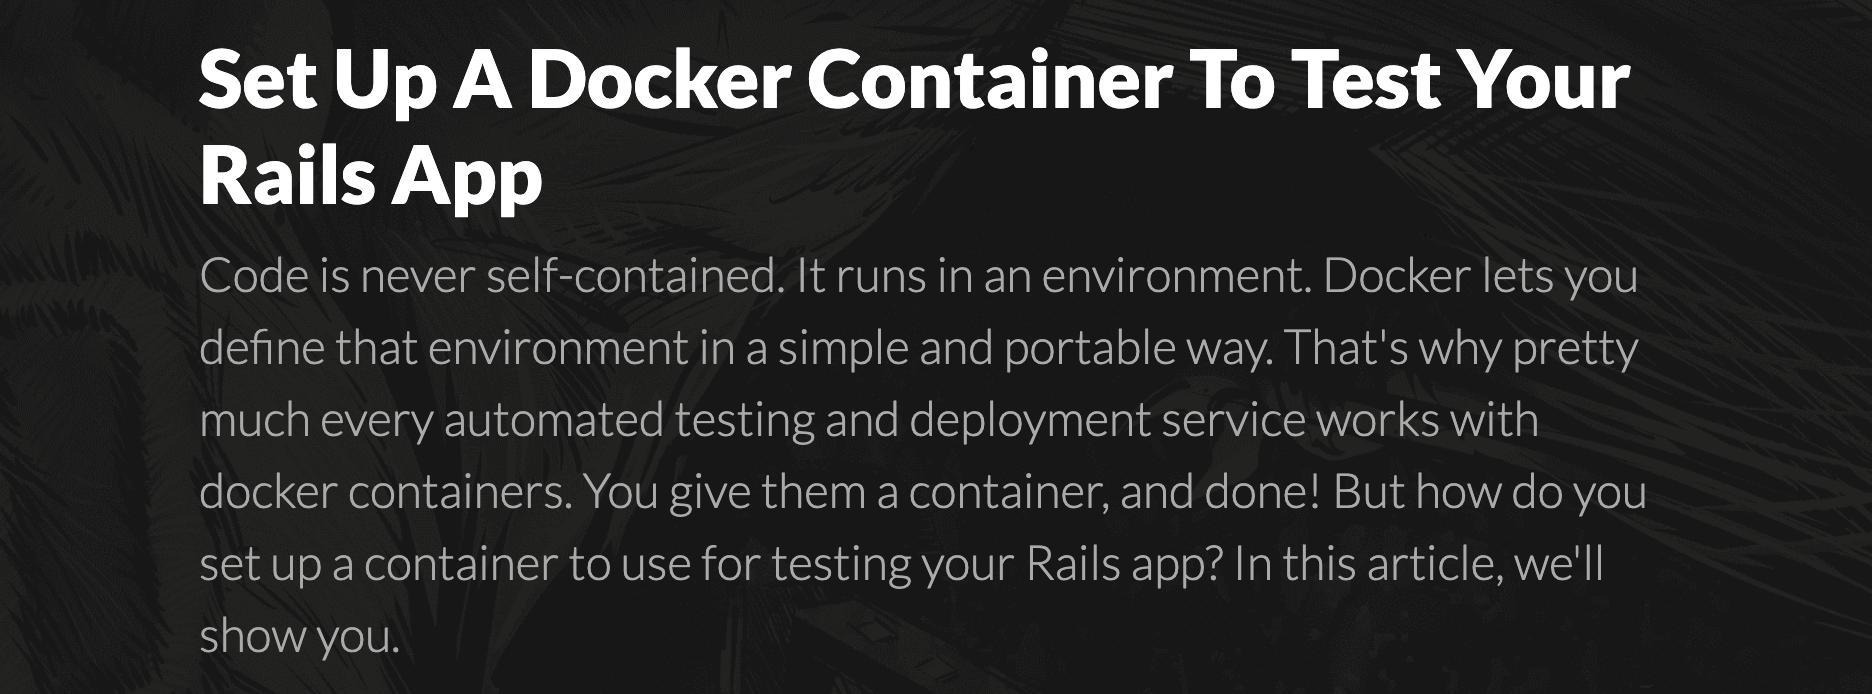 ruby 如何用 docker 来运行或部署,这篇文章很详细